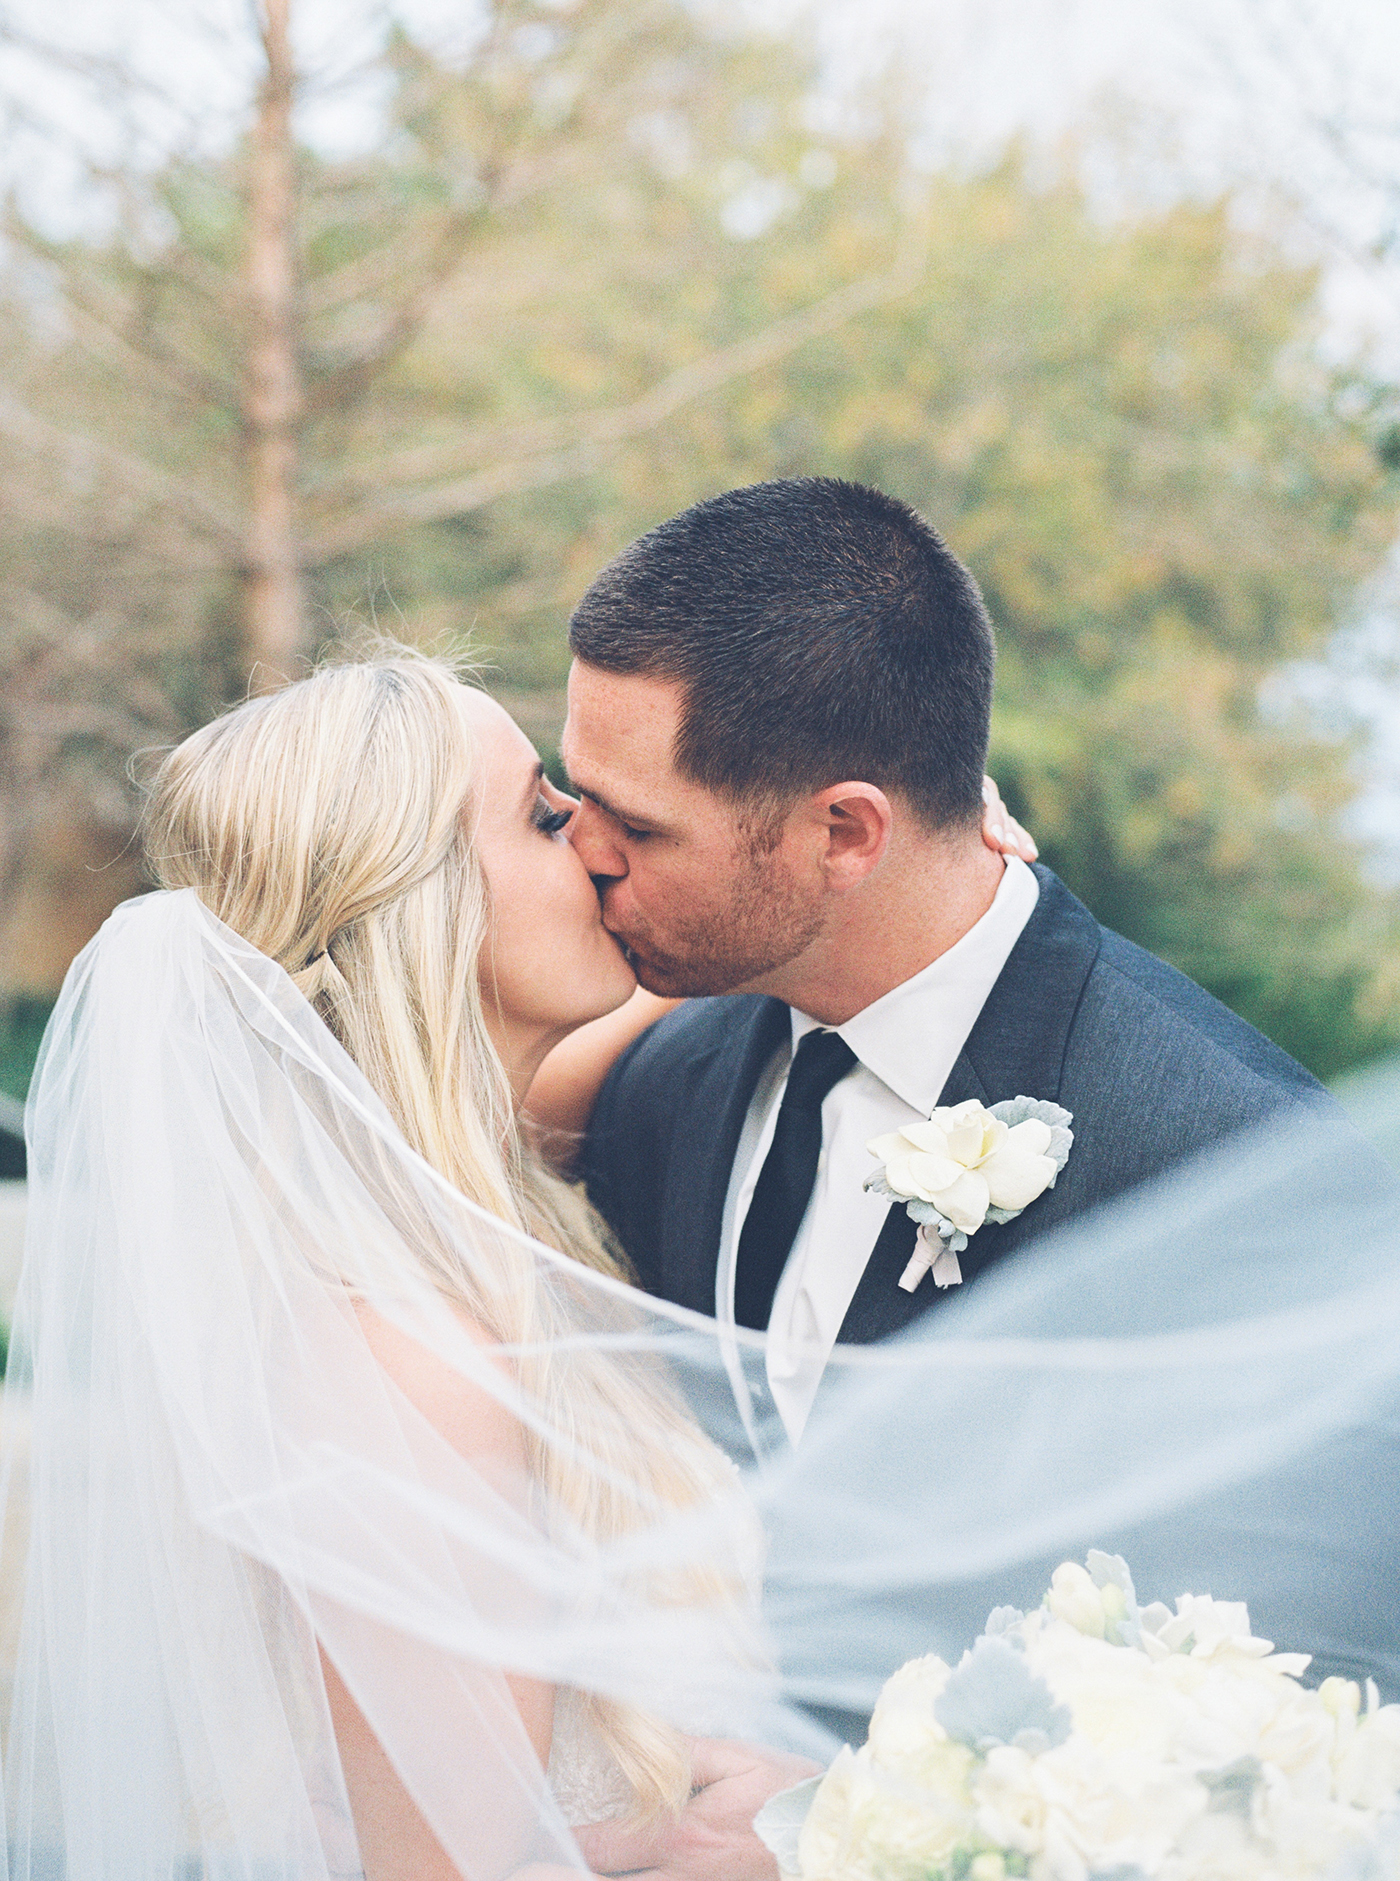 DFW Wedding Planner - Caroline + Jeff at The Four Seasons Hotel Wedding - Allday Events - 125.jpg